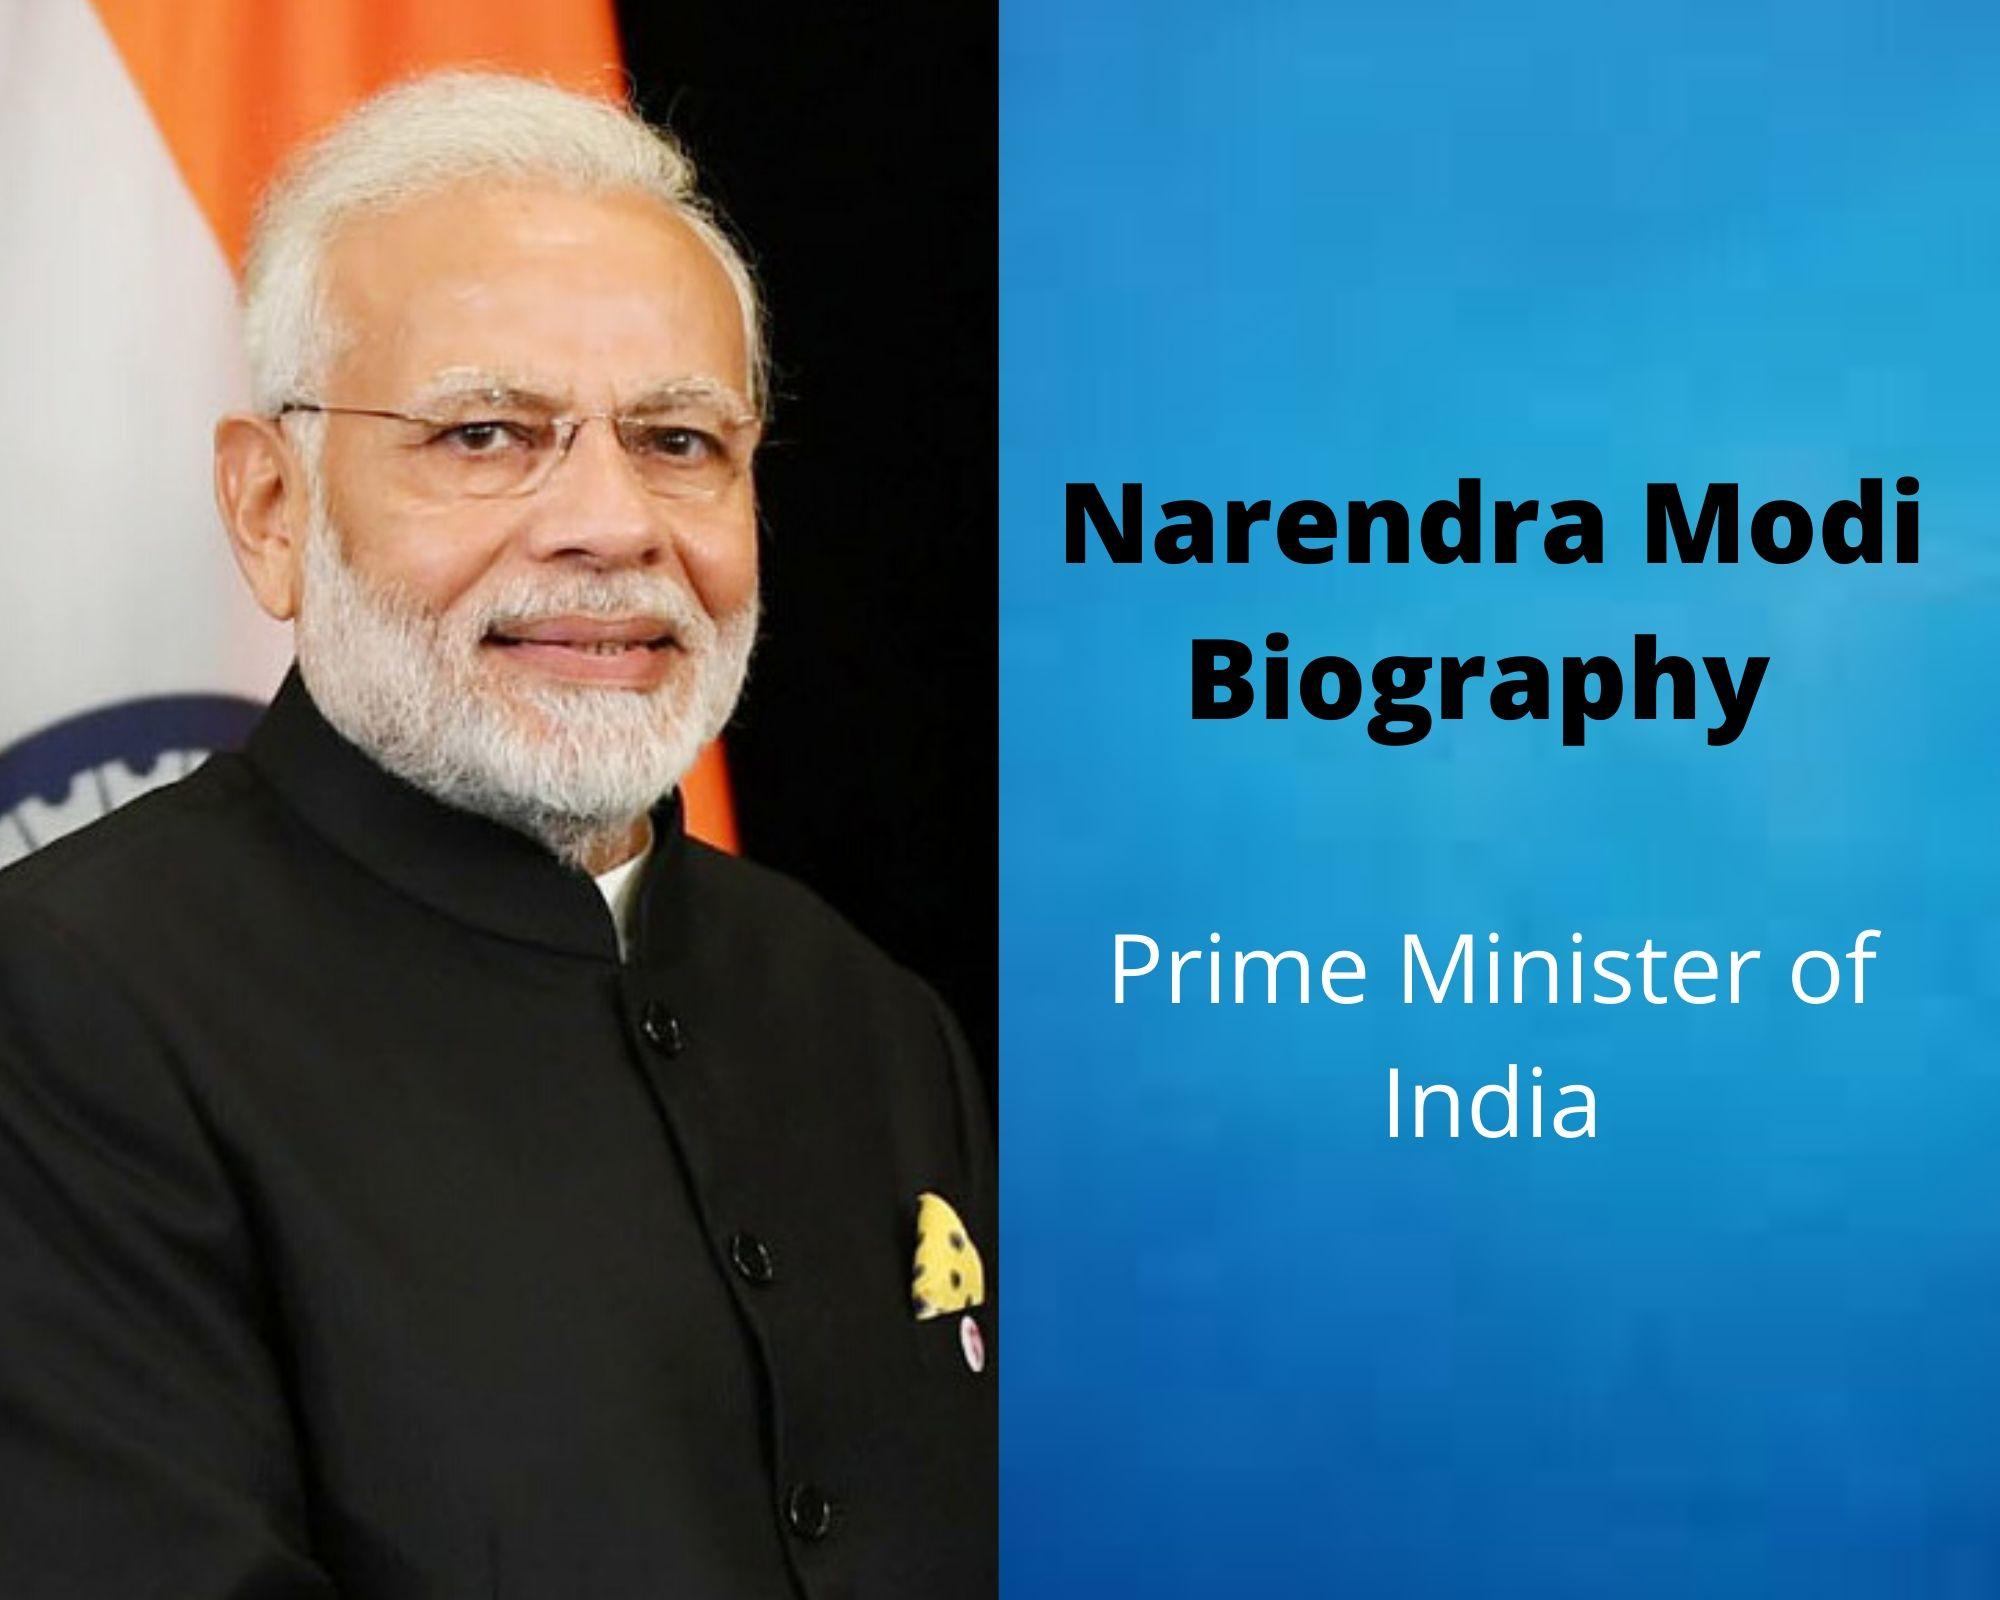 Narendra Modi Biography, Wife, Family,Political Life, Education, Salary